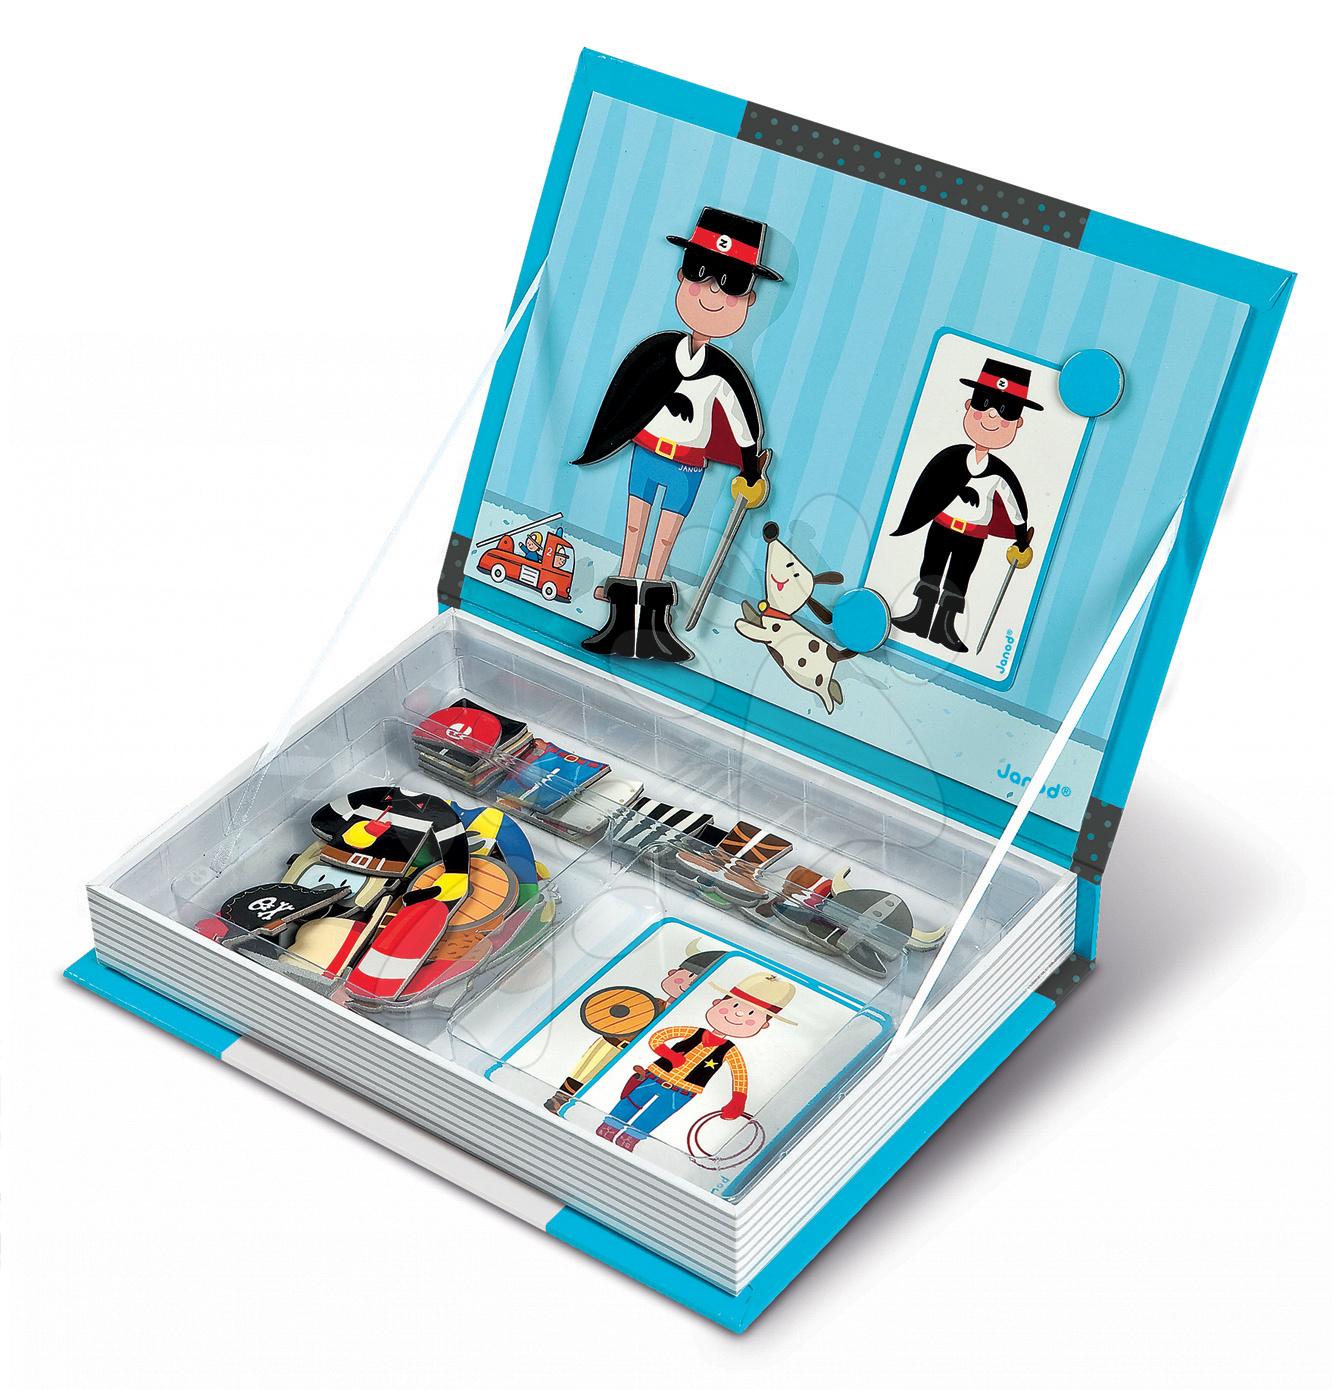 Magnetky pre deti - Magnetická kniha Boy's Outfits Magneti'Book Janod 8 kariet